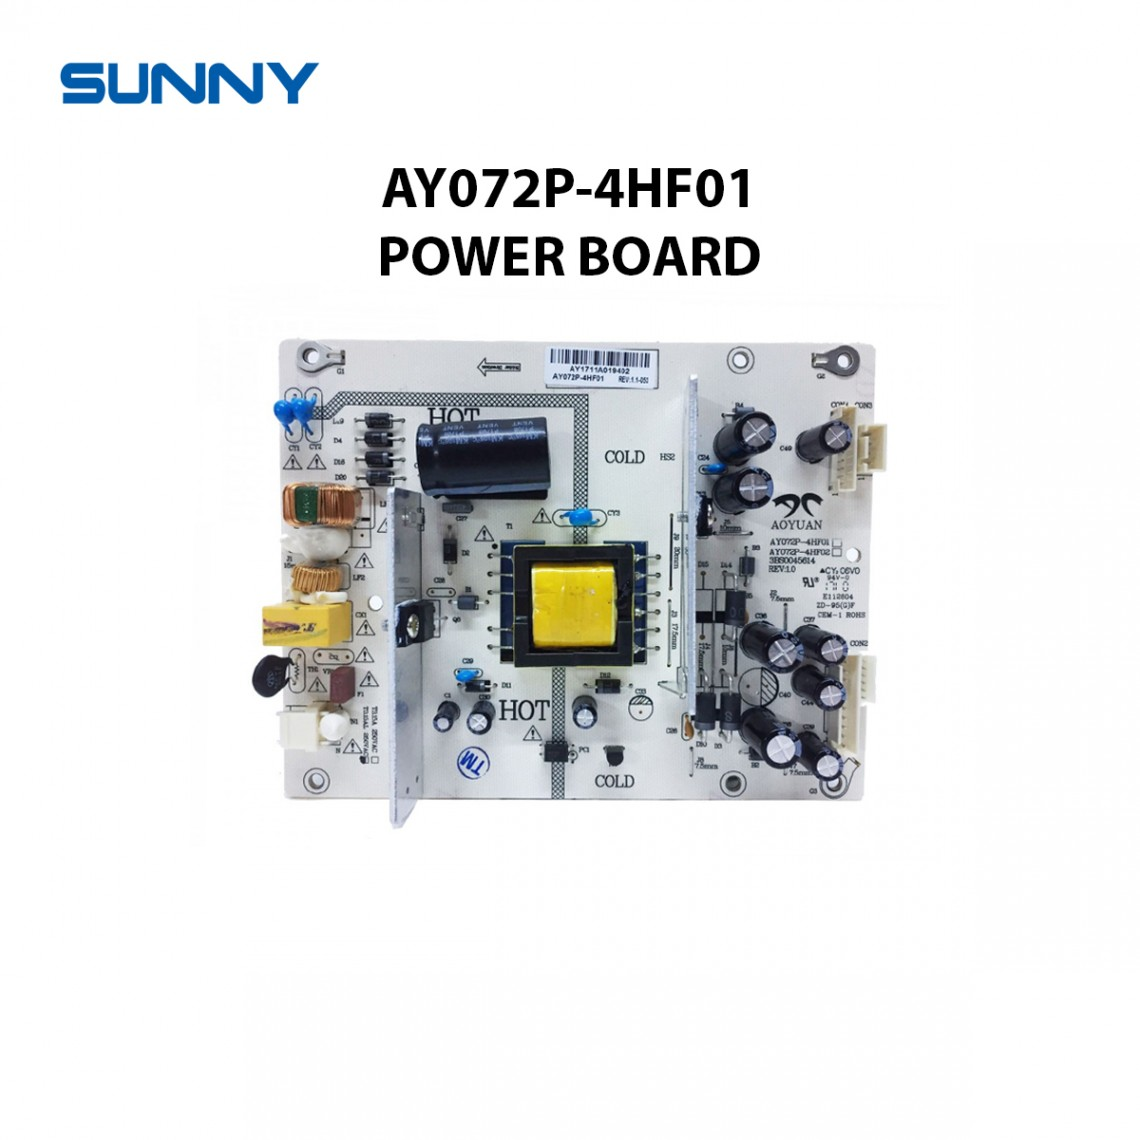 AY072P-4HF01 , 3BS0045614 , REV:1.0 , Sunny , AX032DLD12AT022-TM , AX032DLD12SB021-KM, BESLEME KARTI ,POWER BOARD